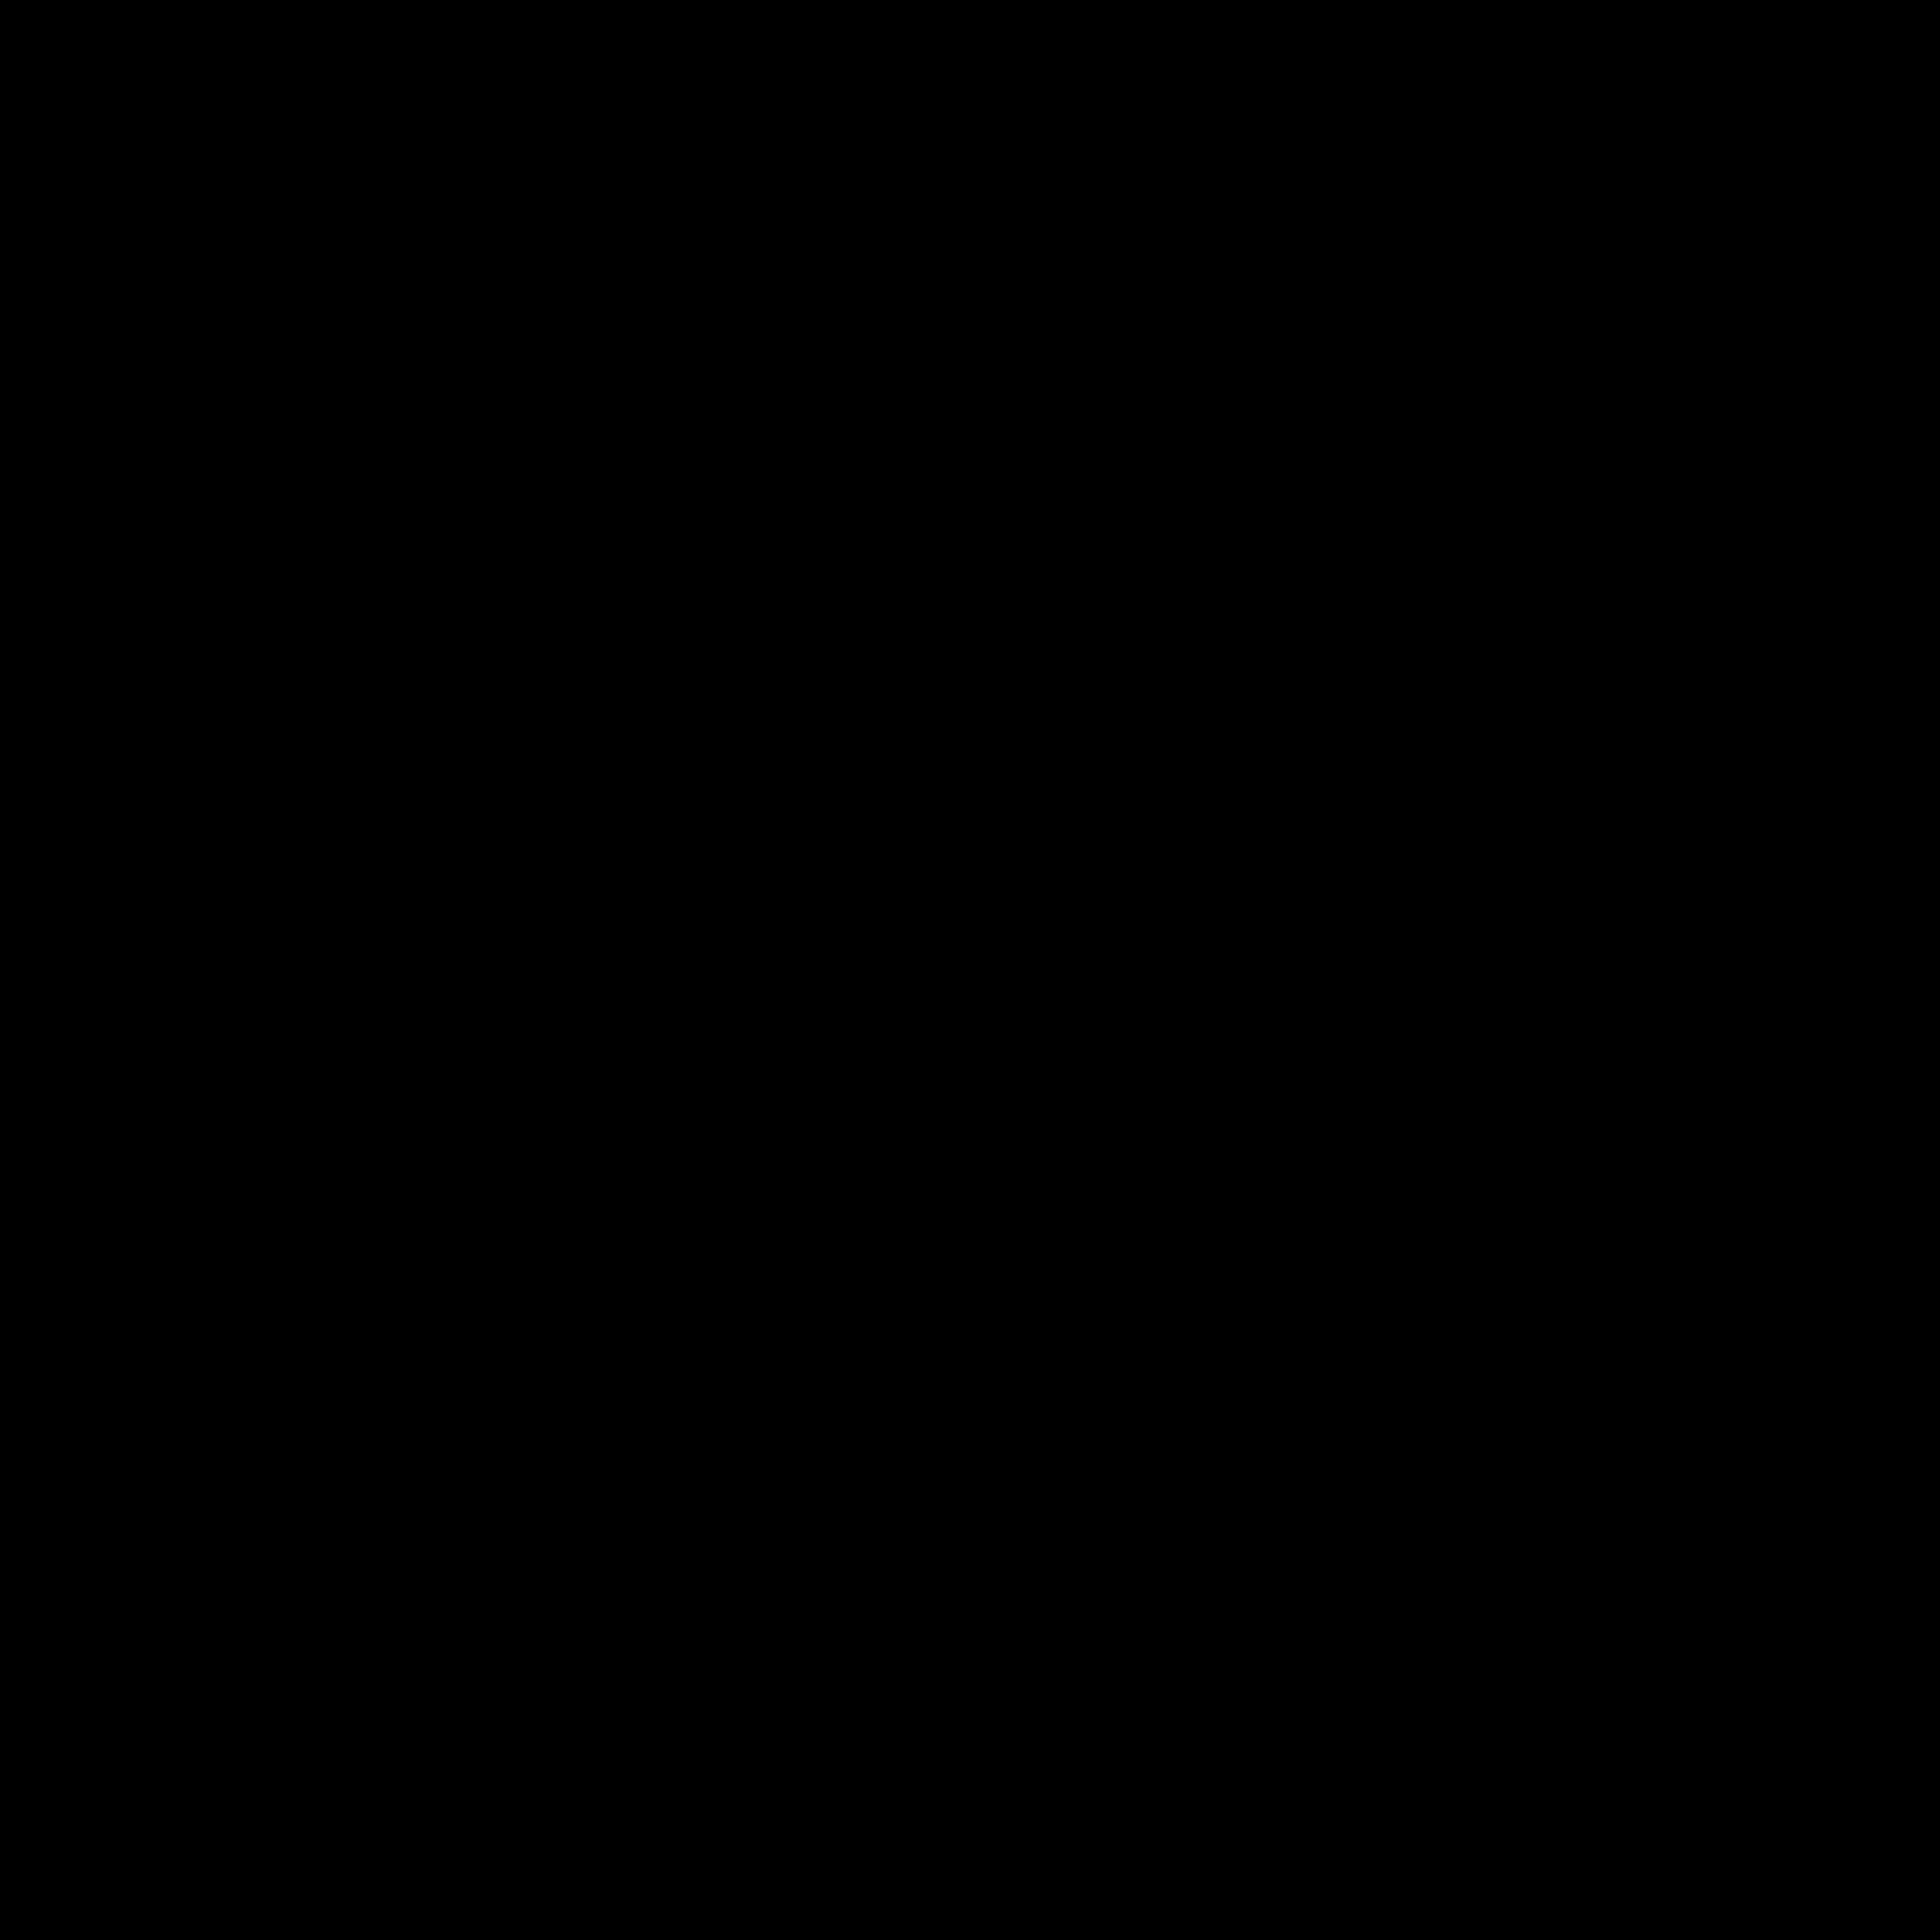 pantala